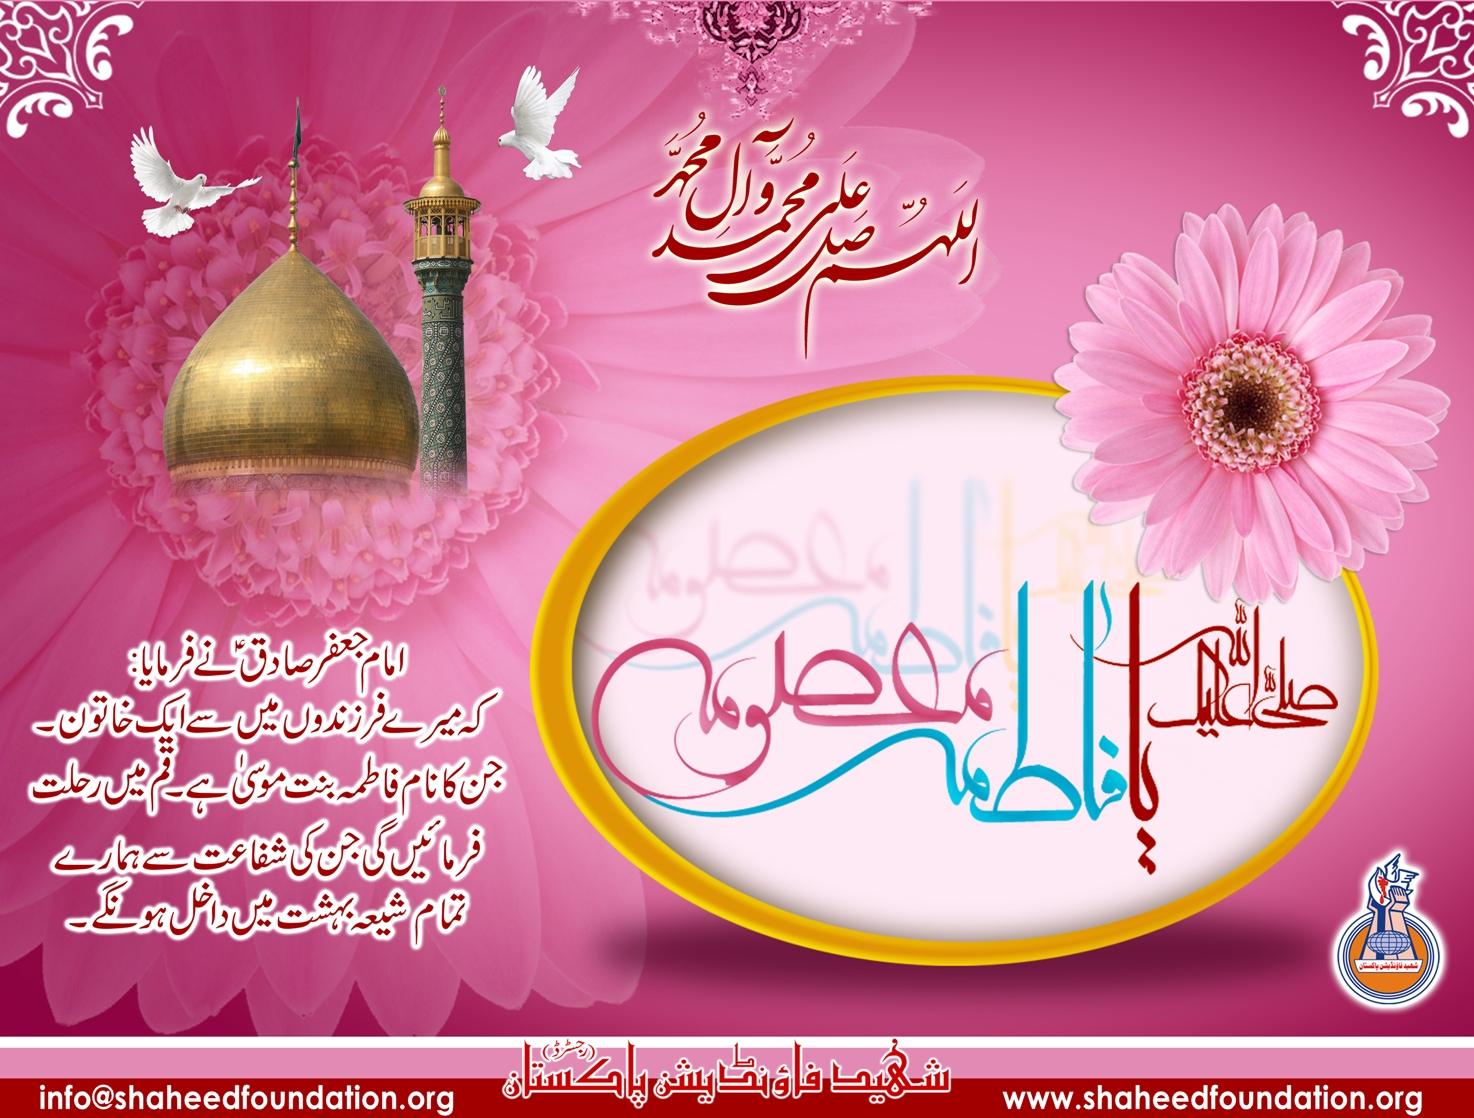 Birth Anniversary of Hazrat Fatima Masoomah(A.S.)